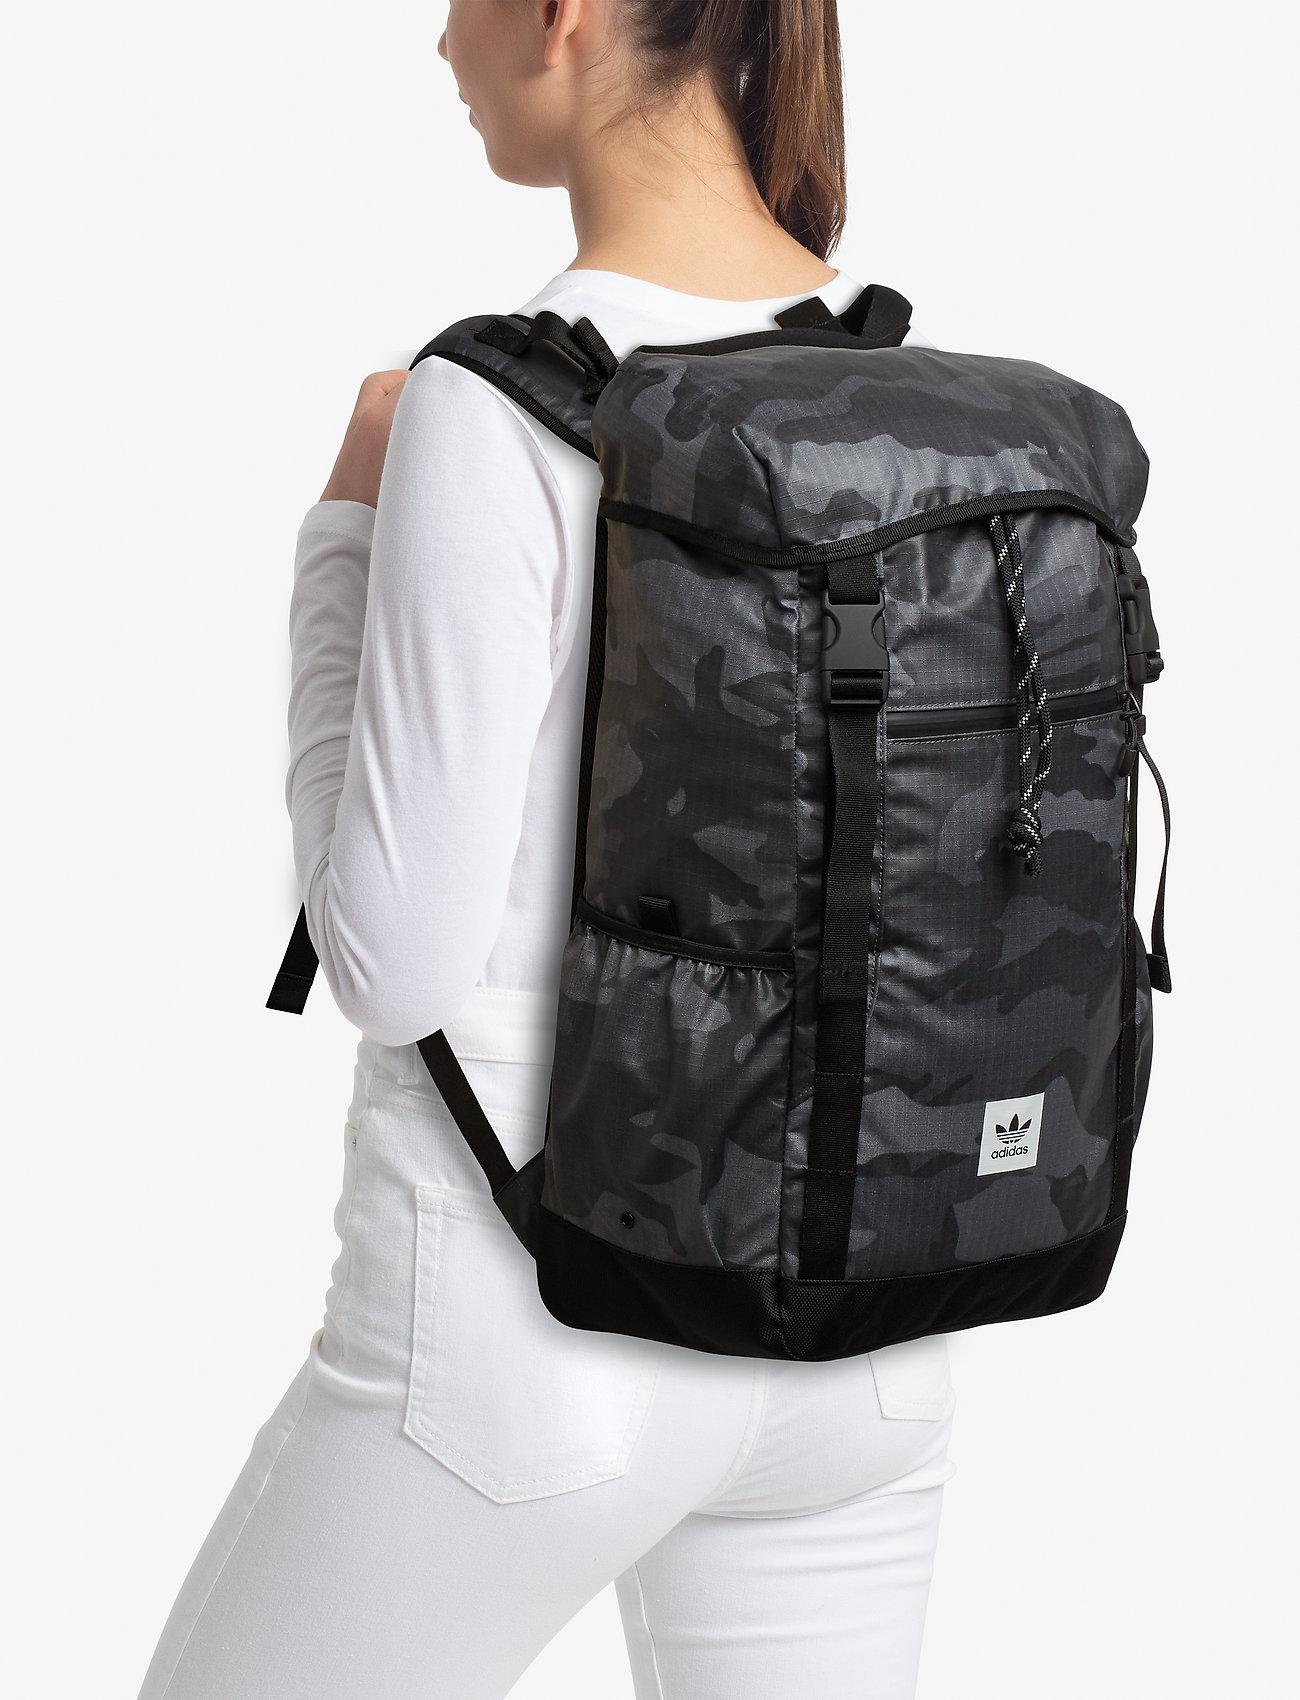 adidas Originals TOPLOADER BP - MULTCO/BLACK